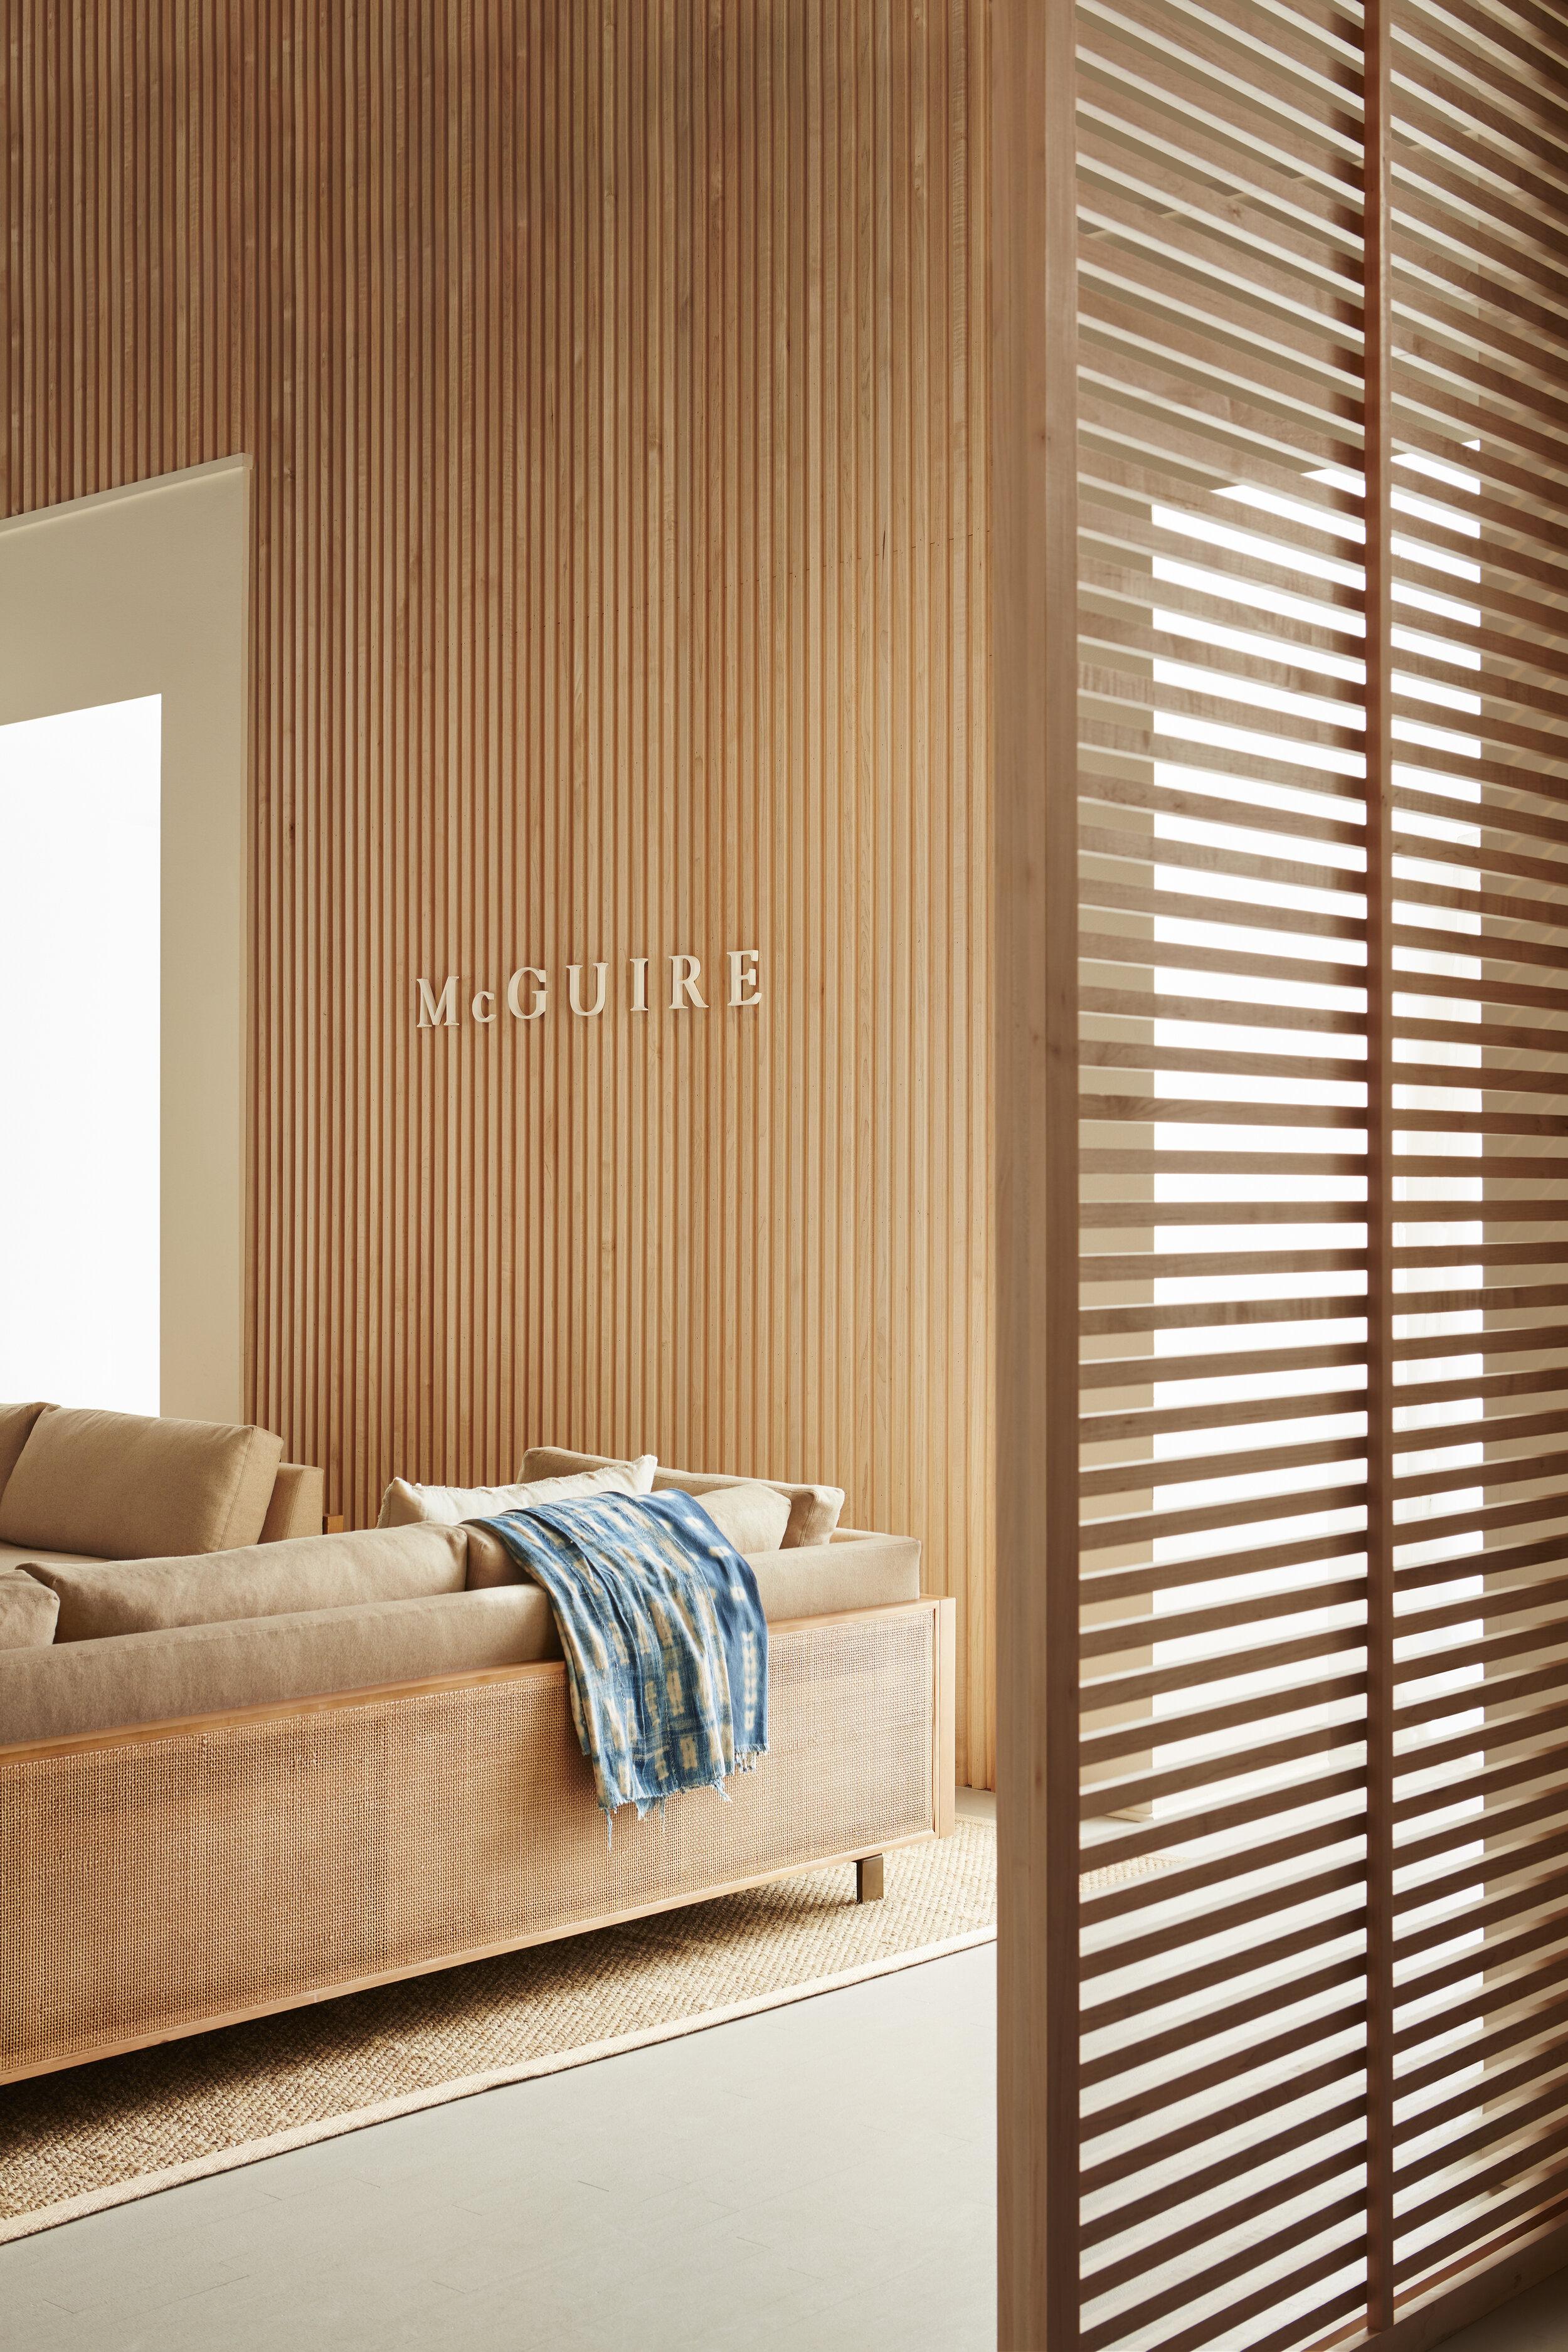 McGuireFront_LivingRoom_1.jpg